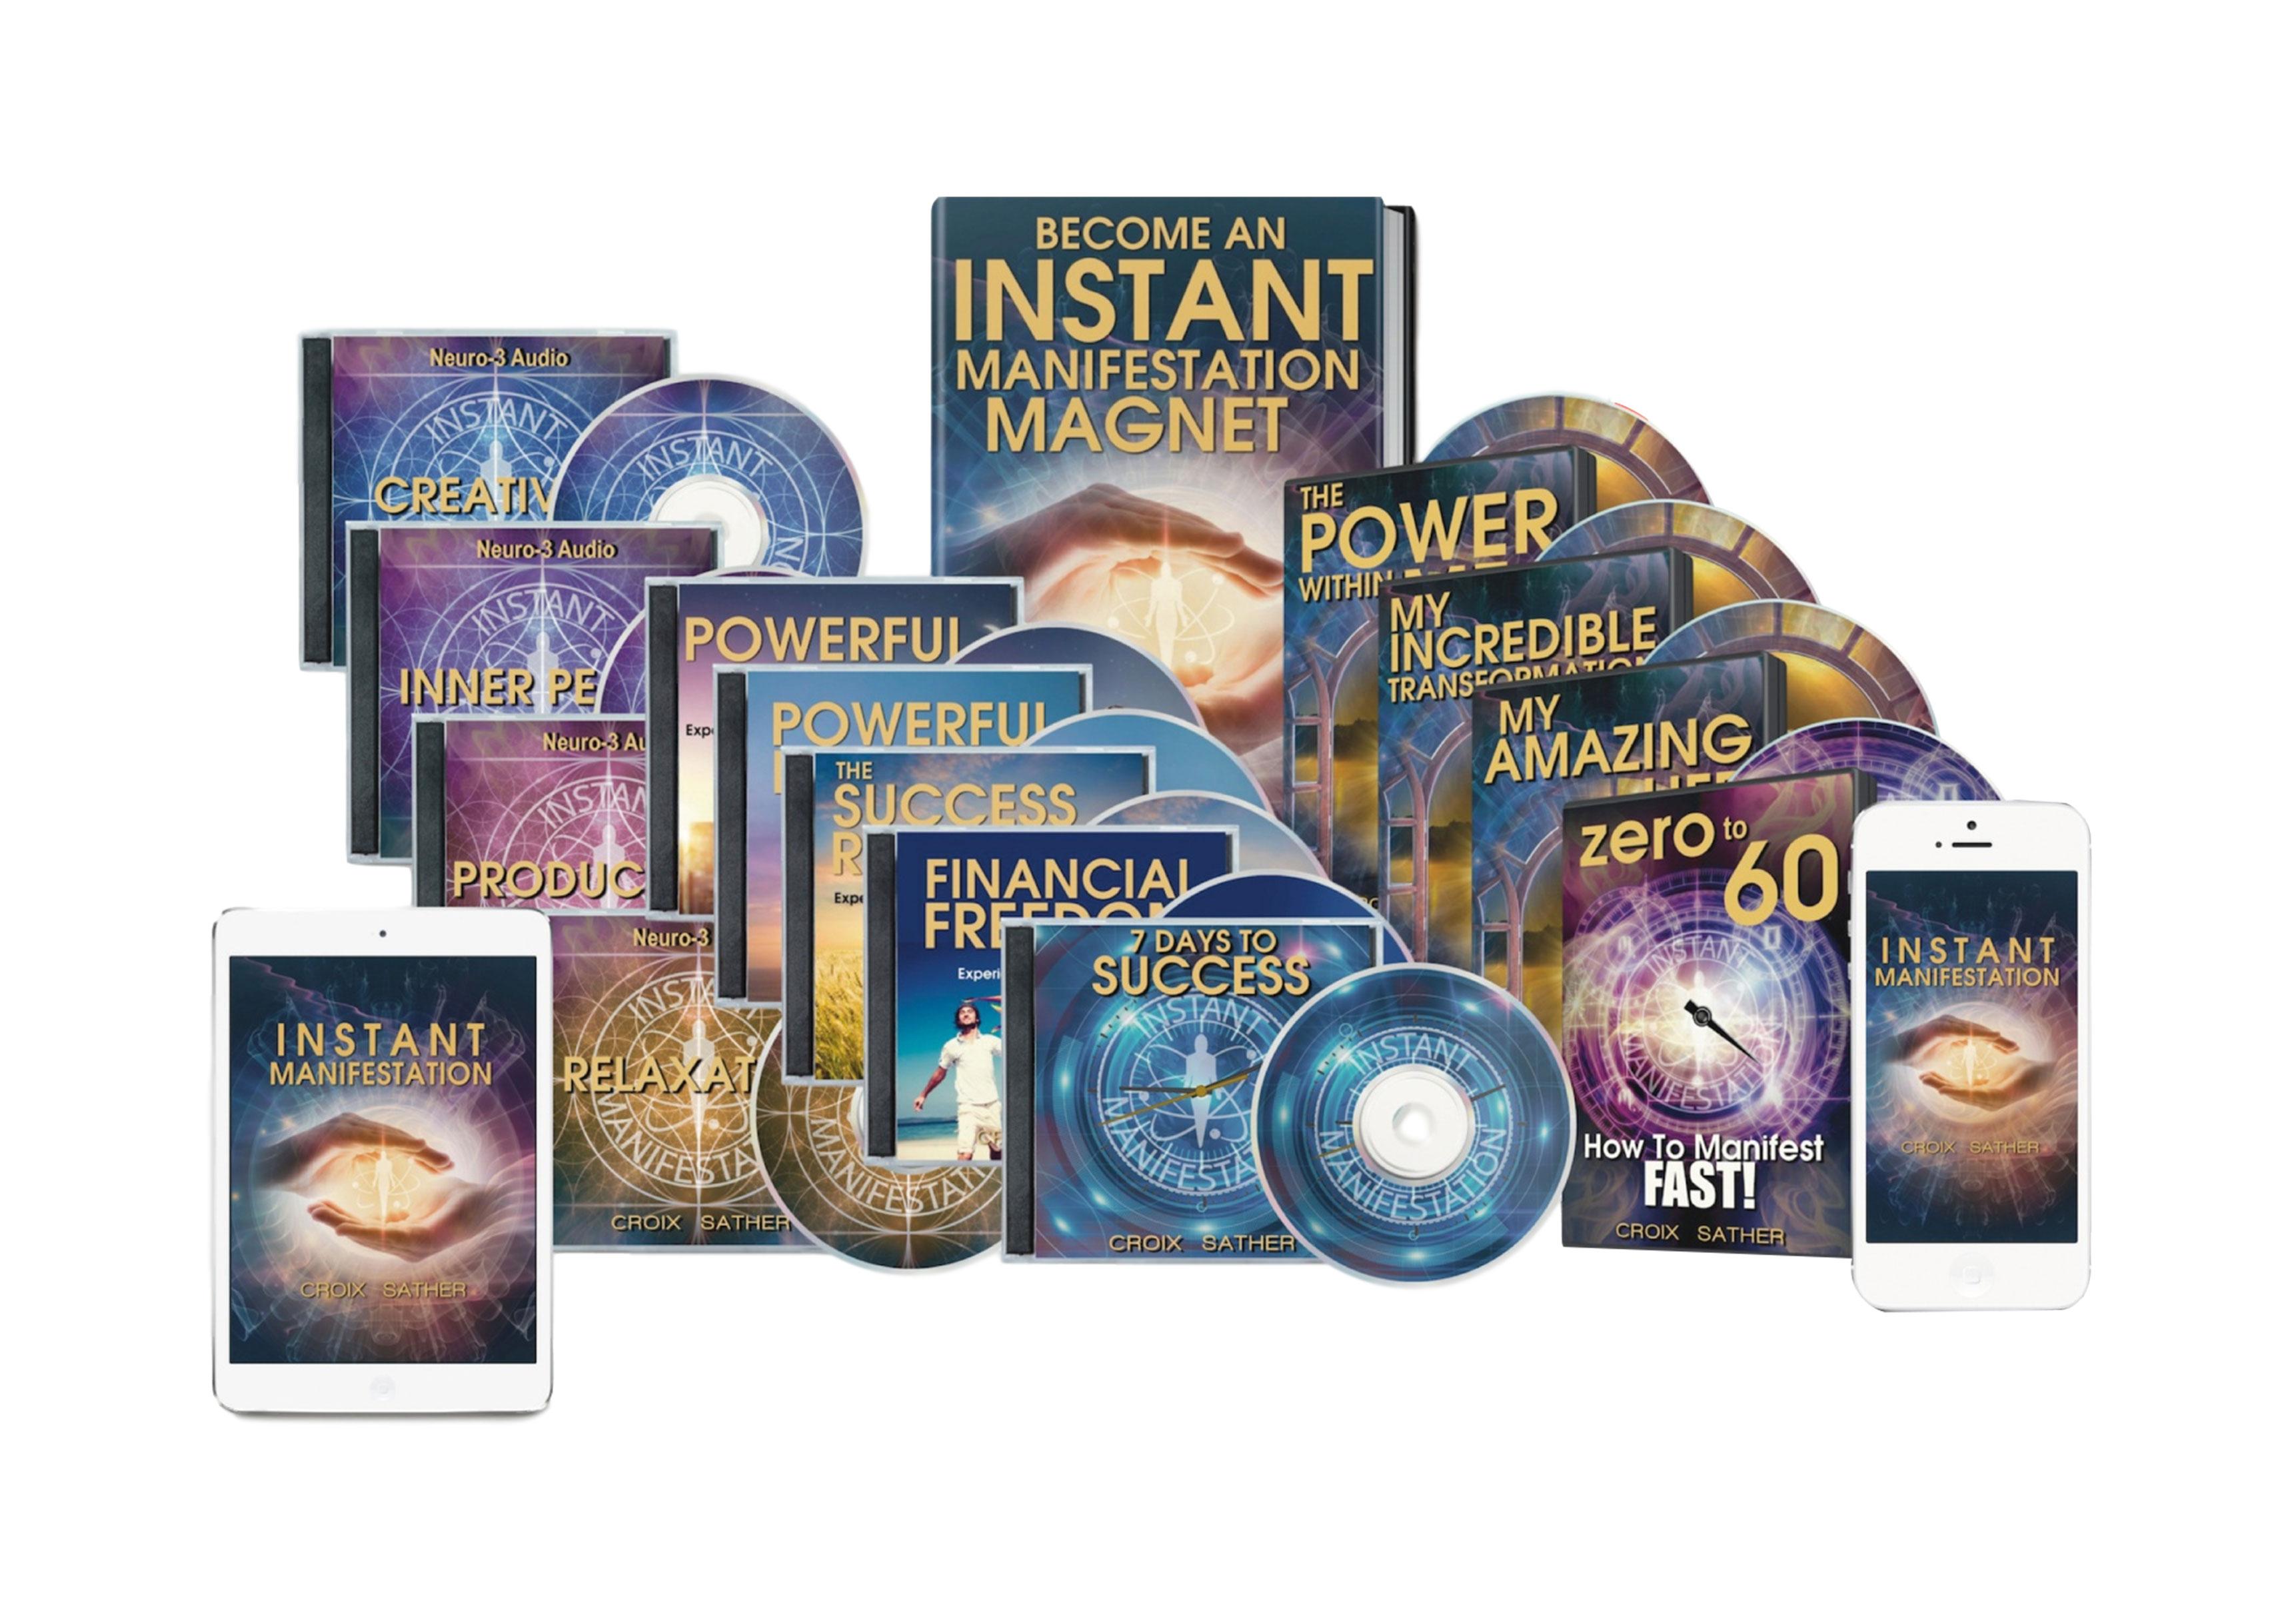 Instant-Manifestation-Secrets-review